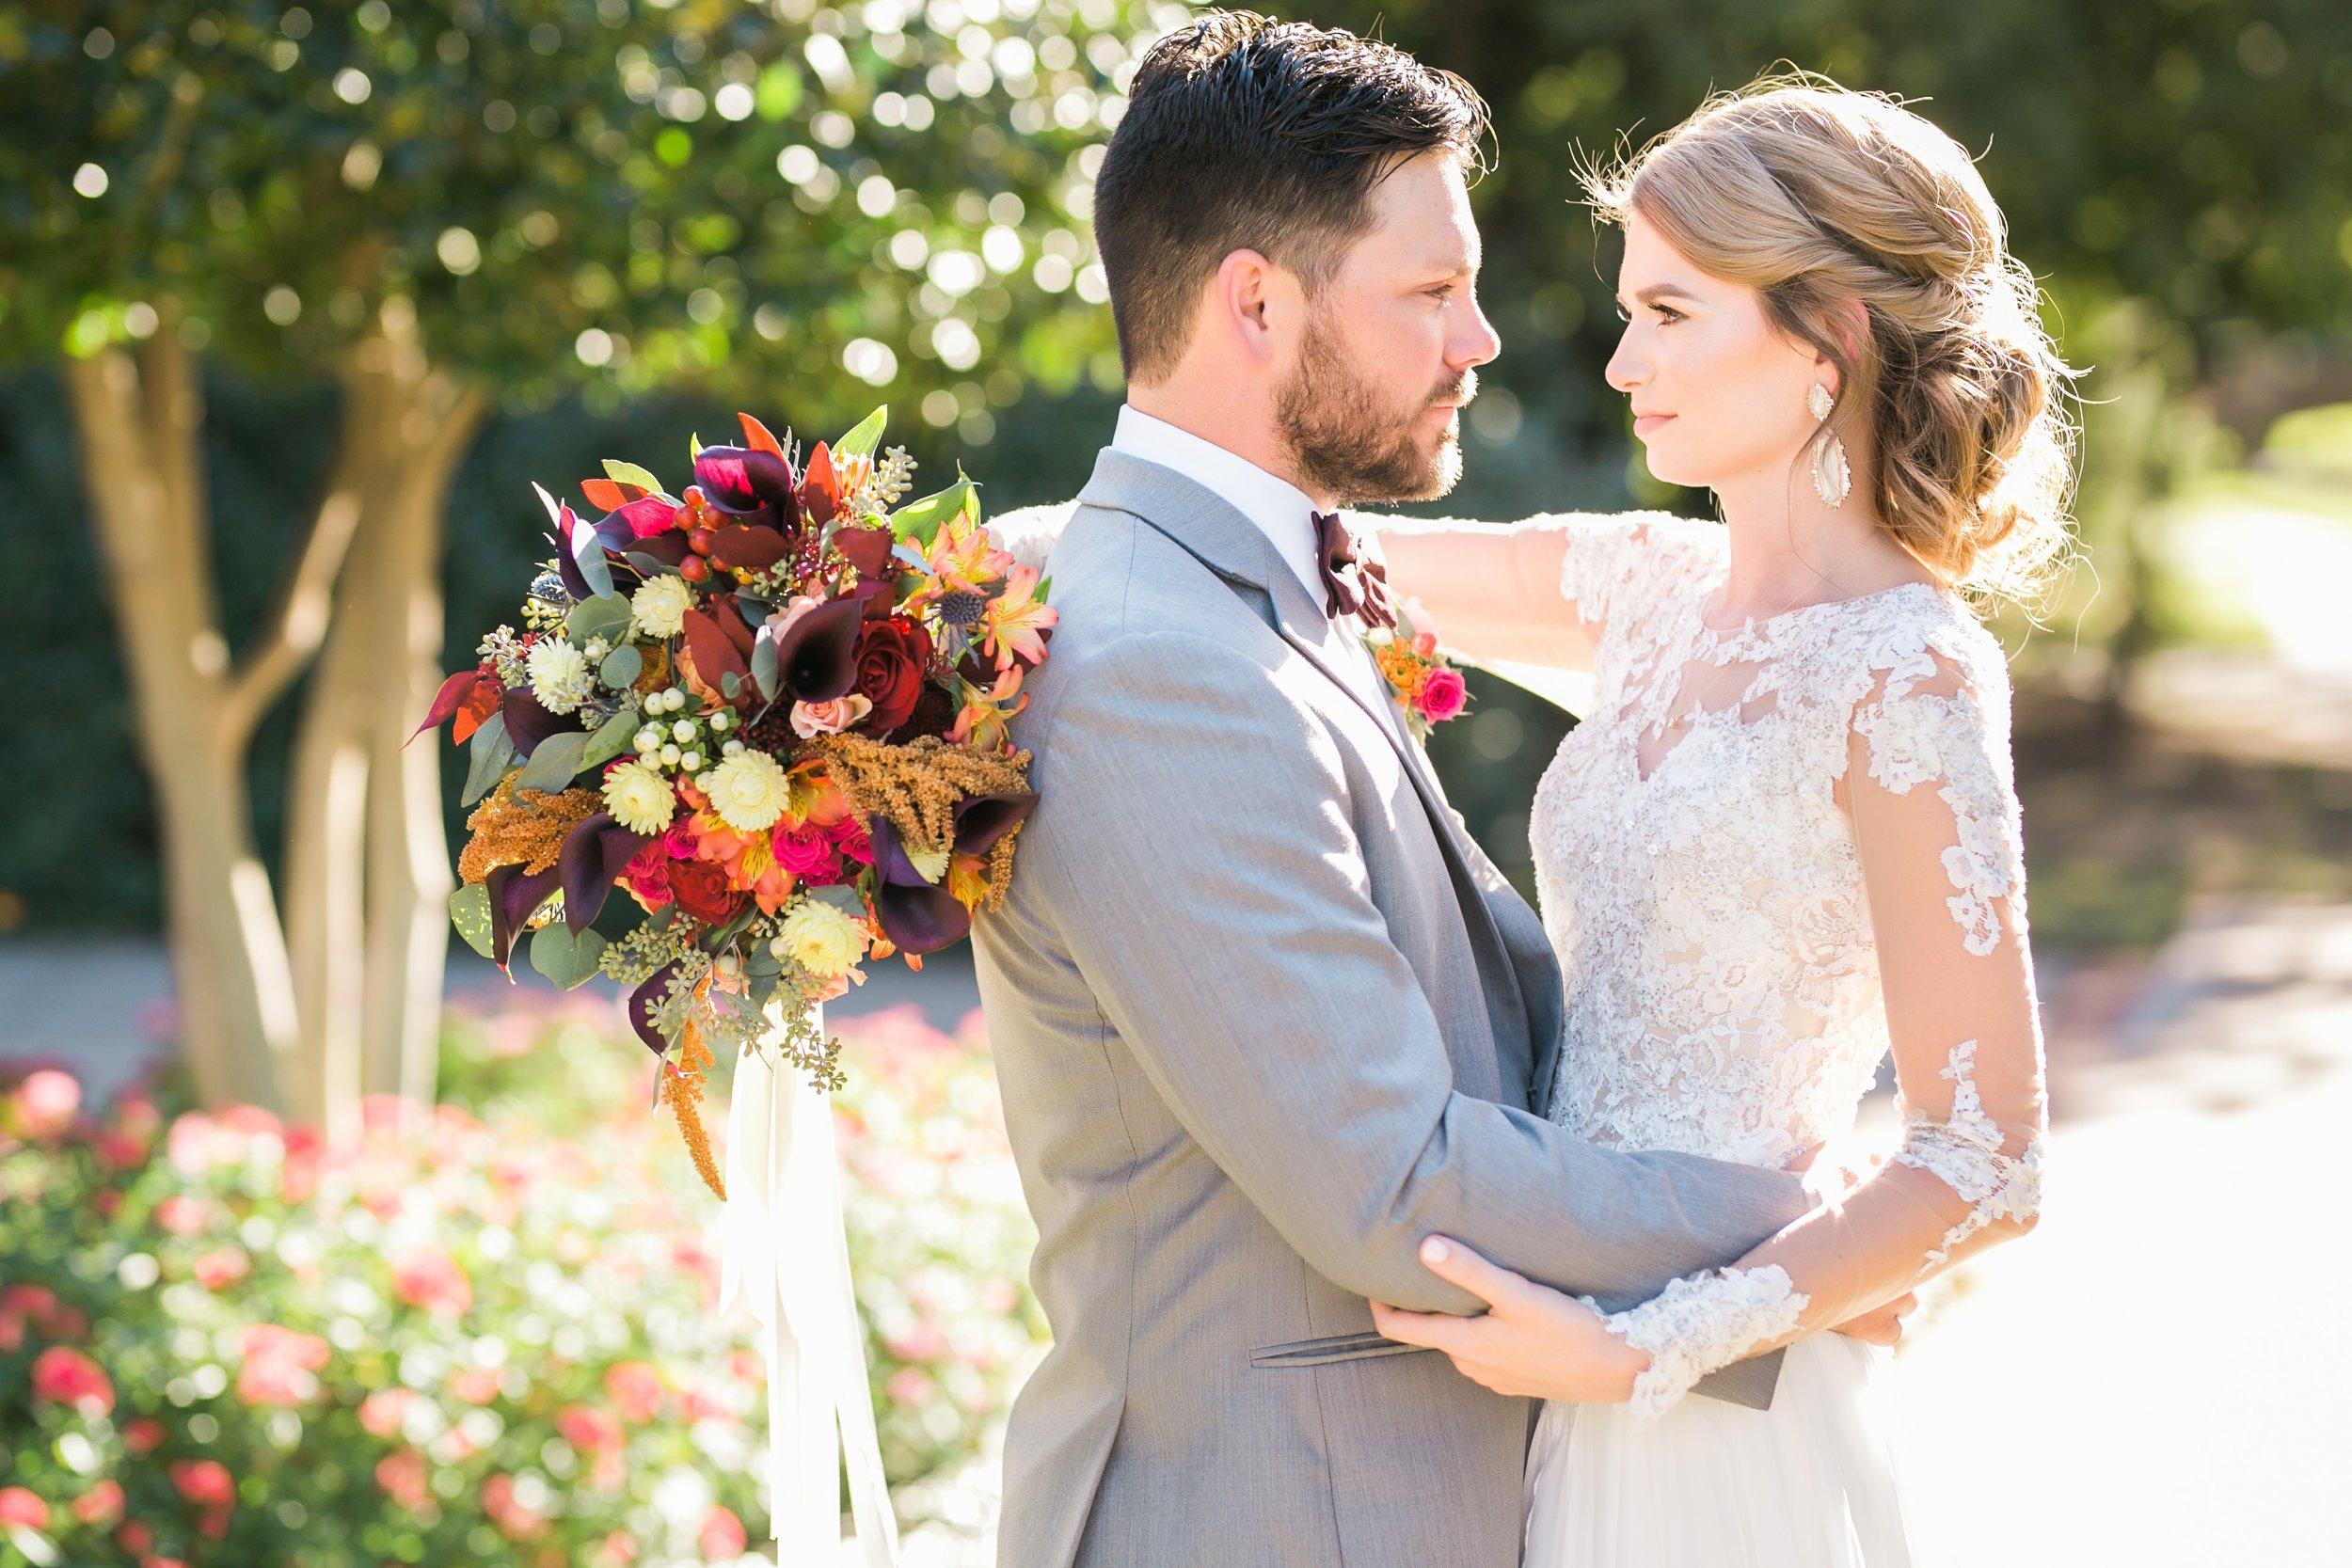 Roberson-Wedding-The-Forum-Lauren-Pinson-Wedding-Photography-Wichita-Falls-Texas-043.jpg